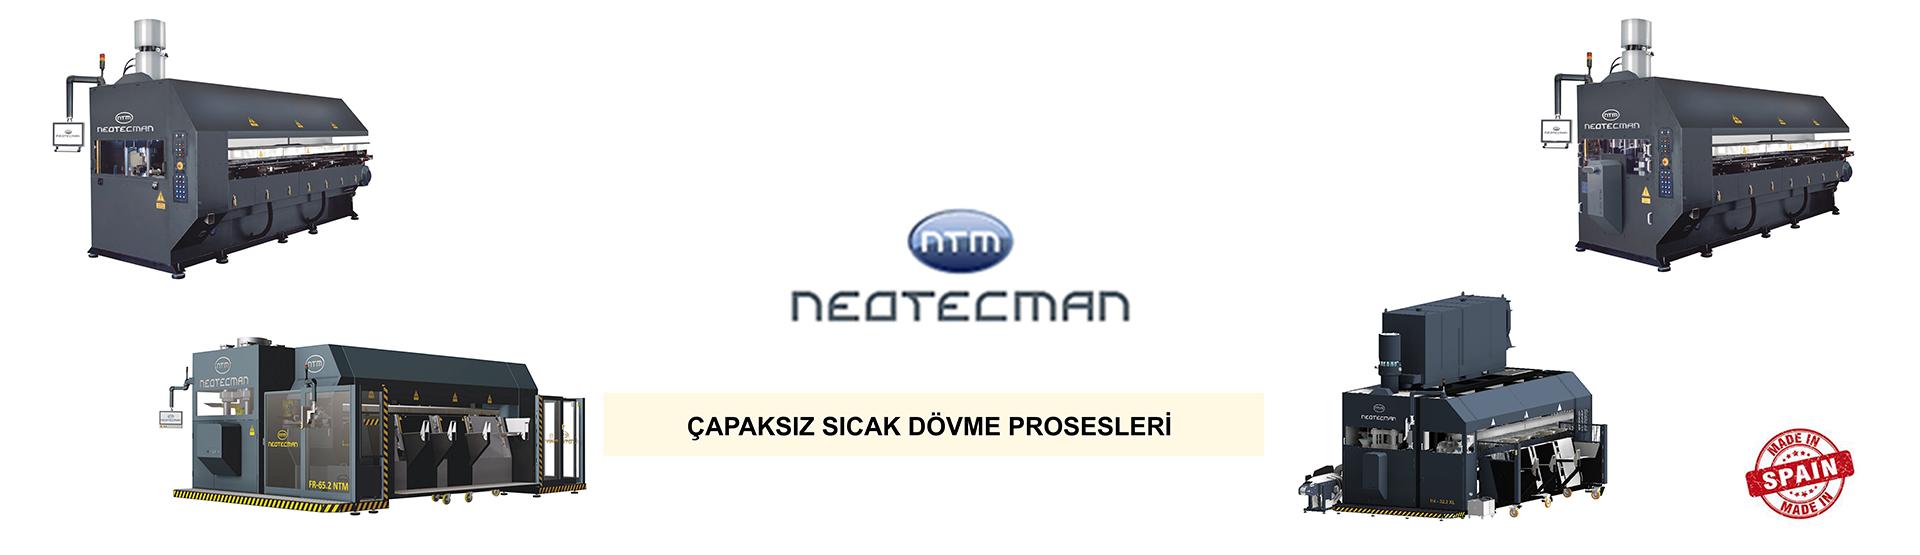 NEOTECMAN